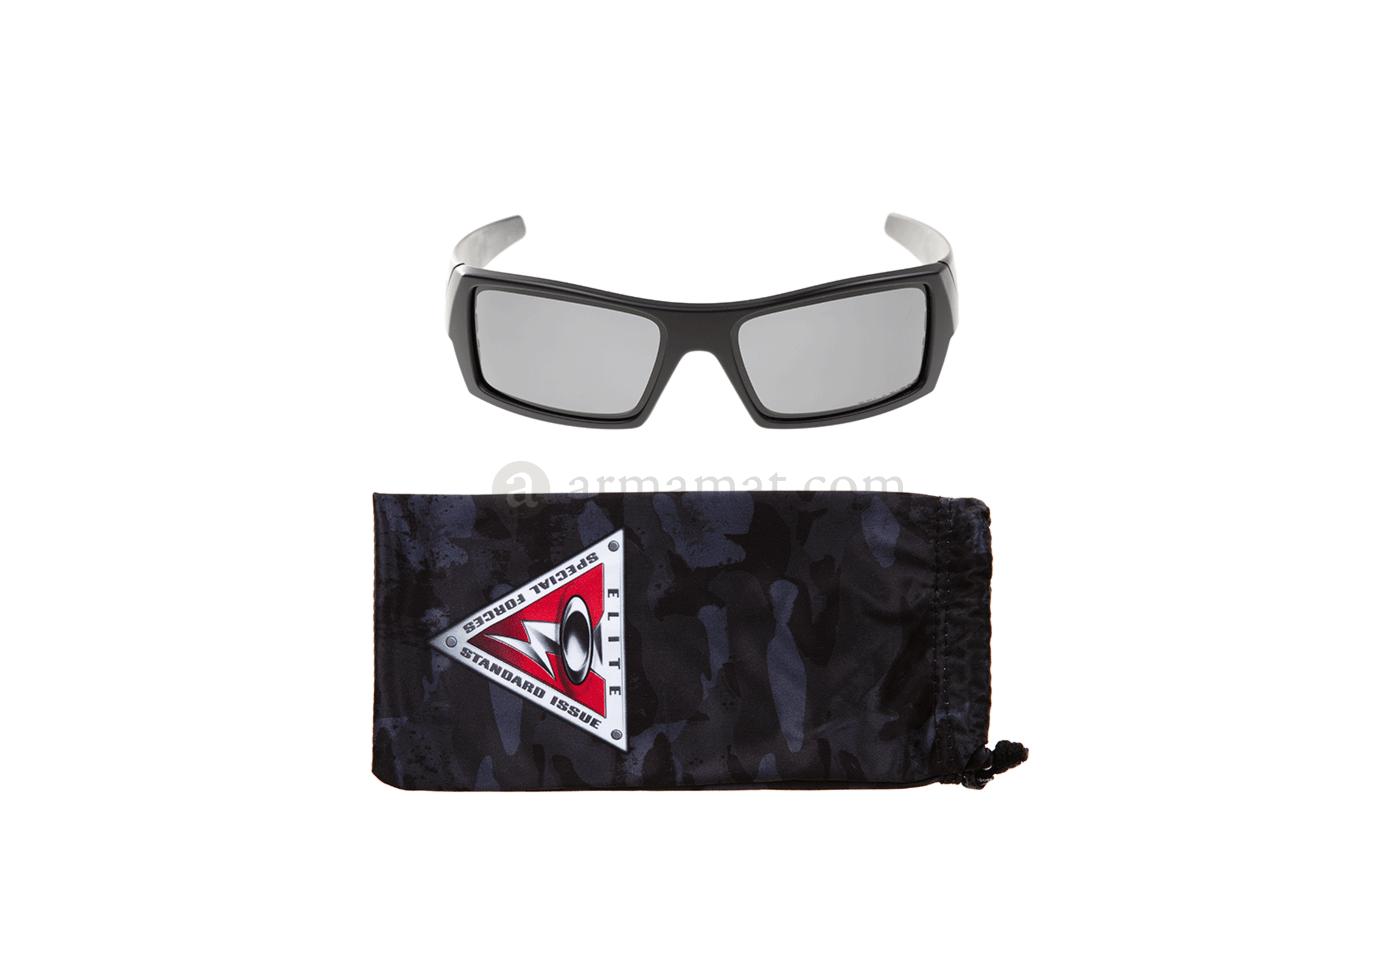 008e0462a04 ... order oakley si blackside gascan sunglasses with satin black frame .  8aea4 6d469